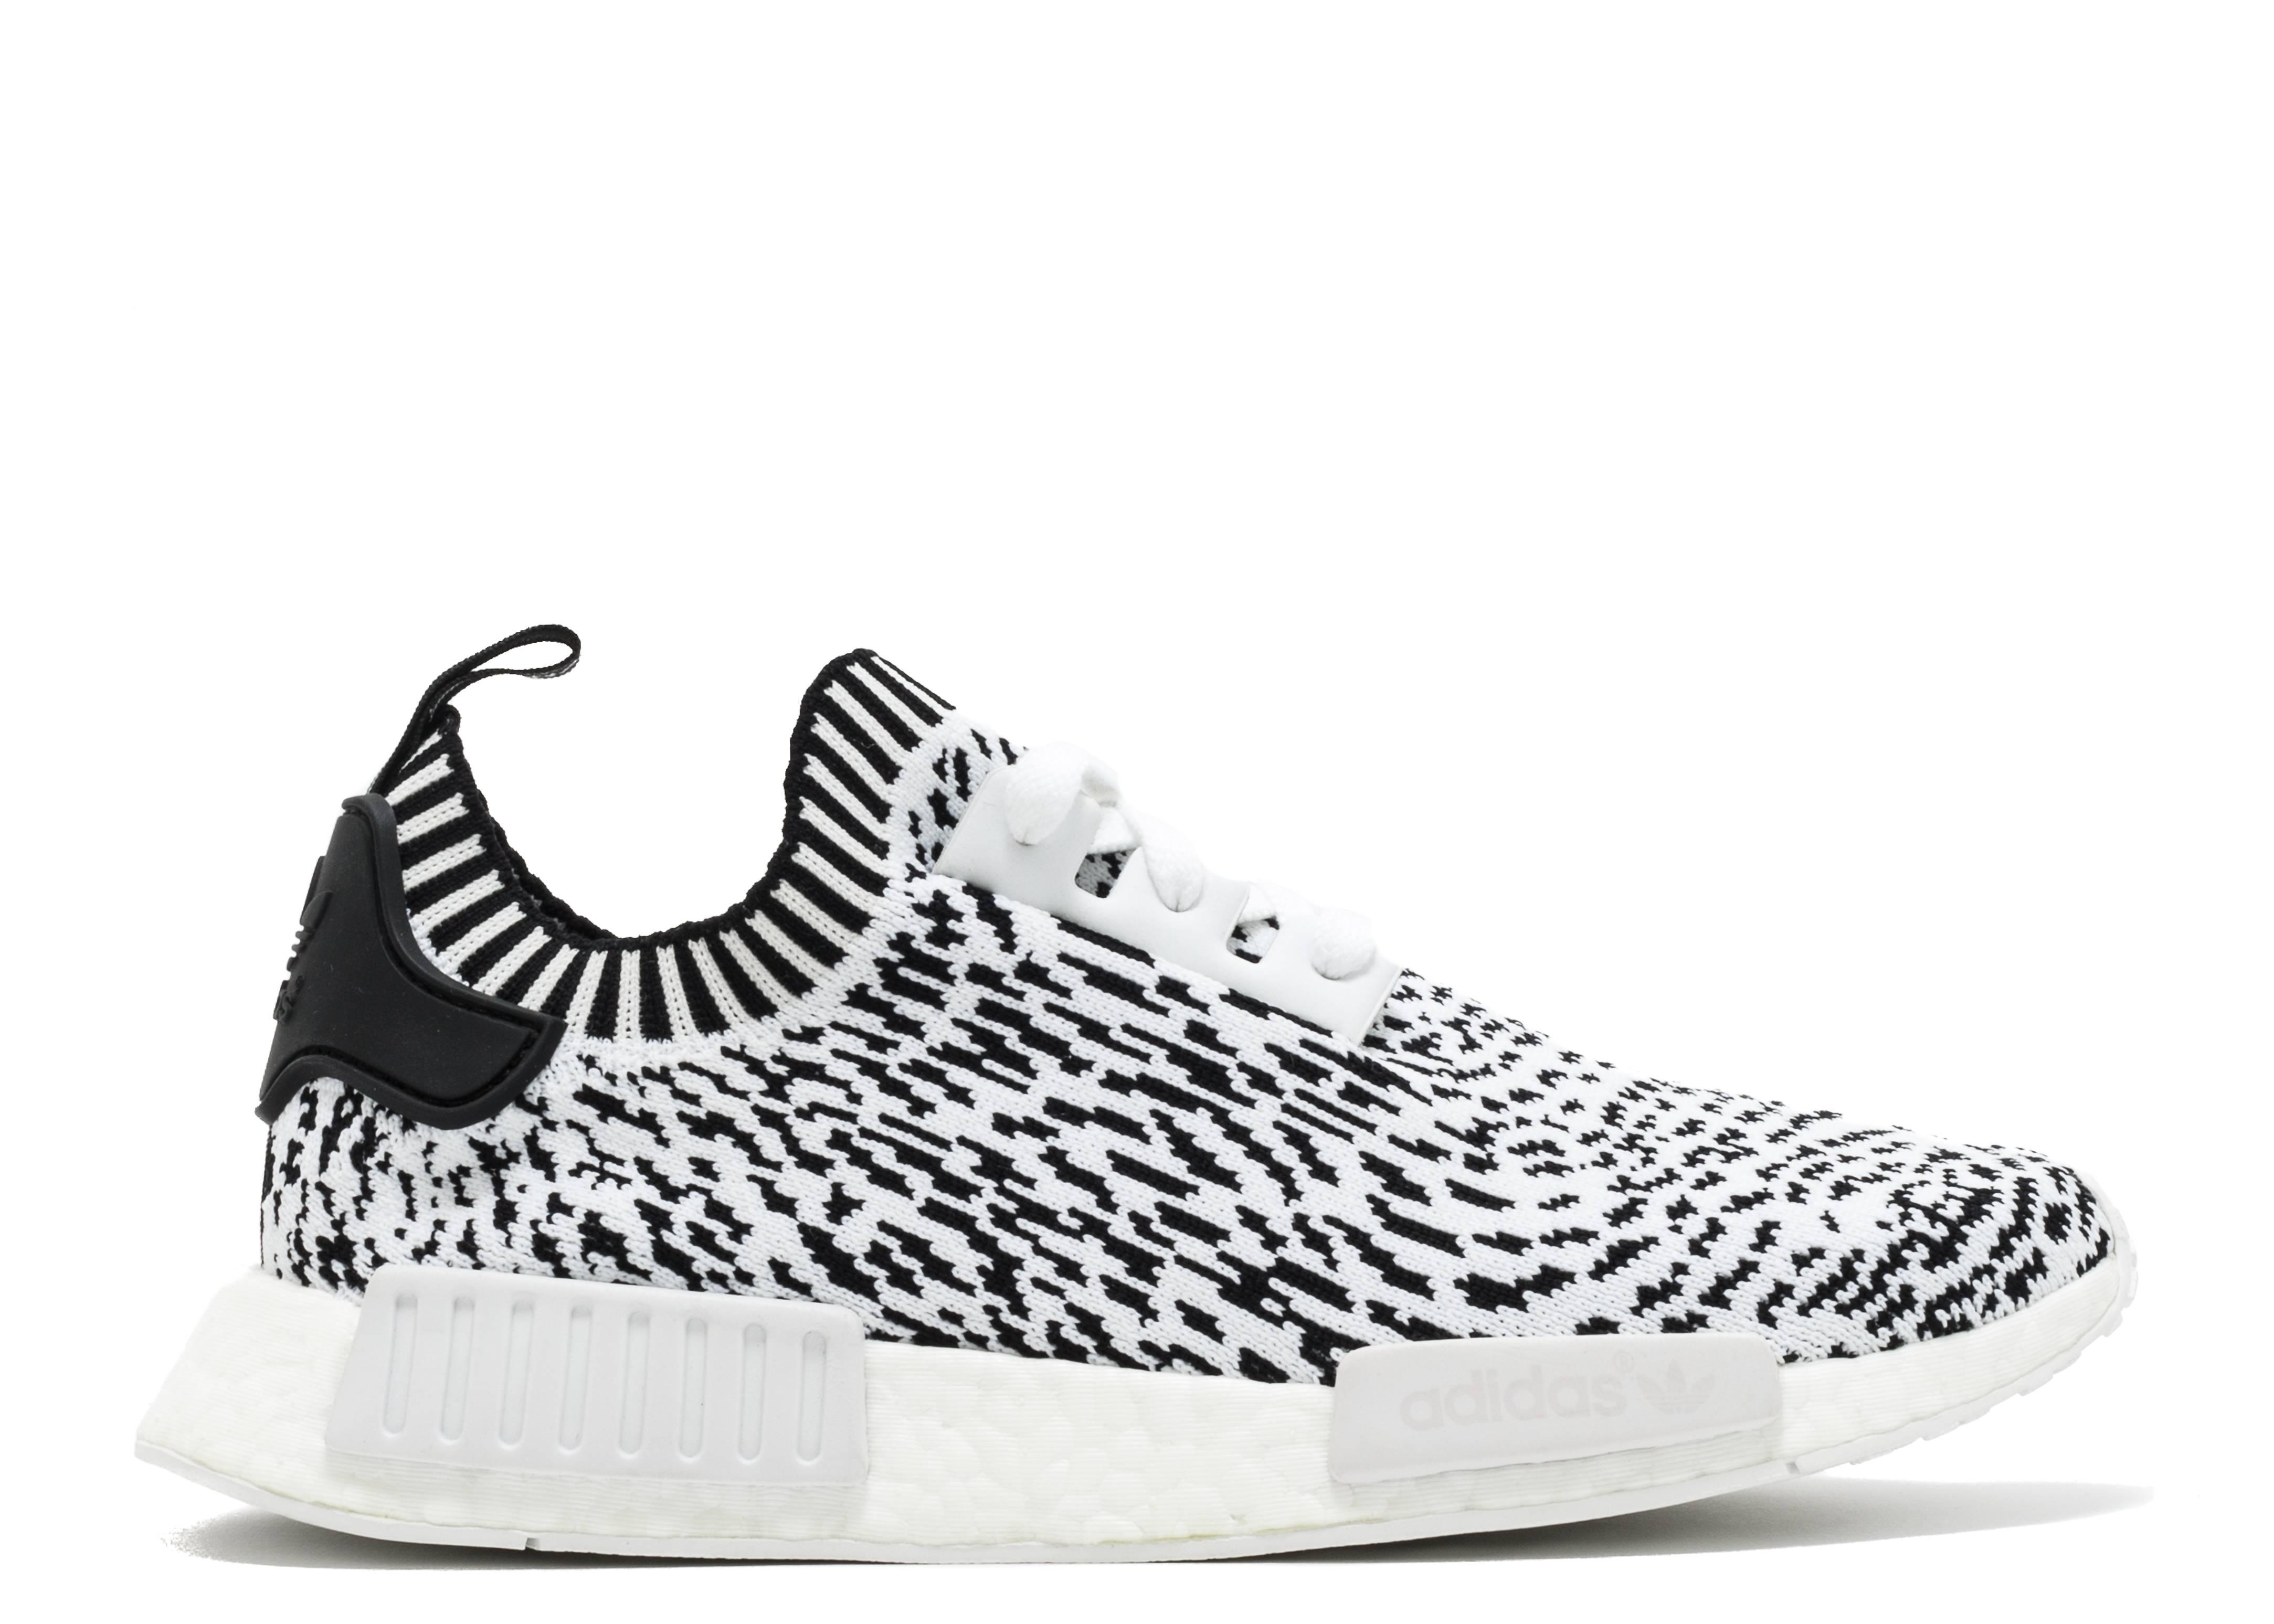 ffc1256d6 adidas NMD R1 Zebra Pack Black  u2013 Fastsole